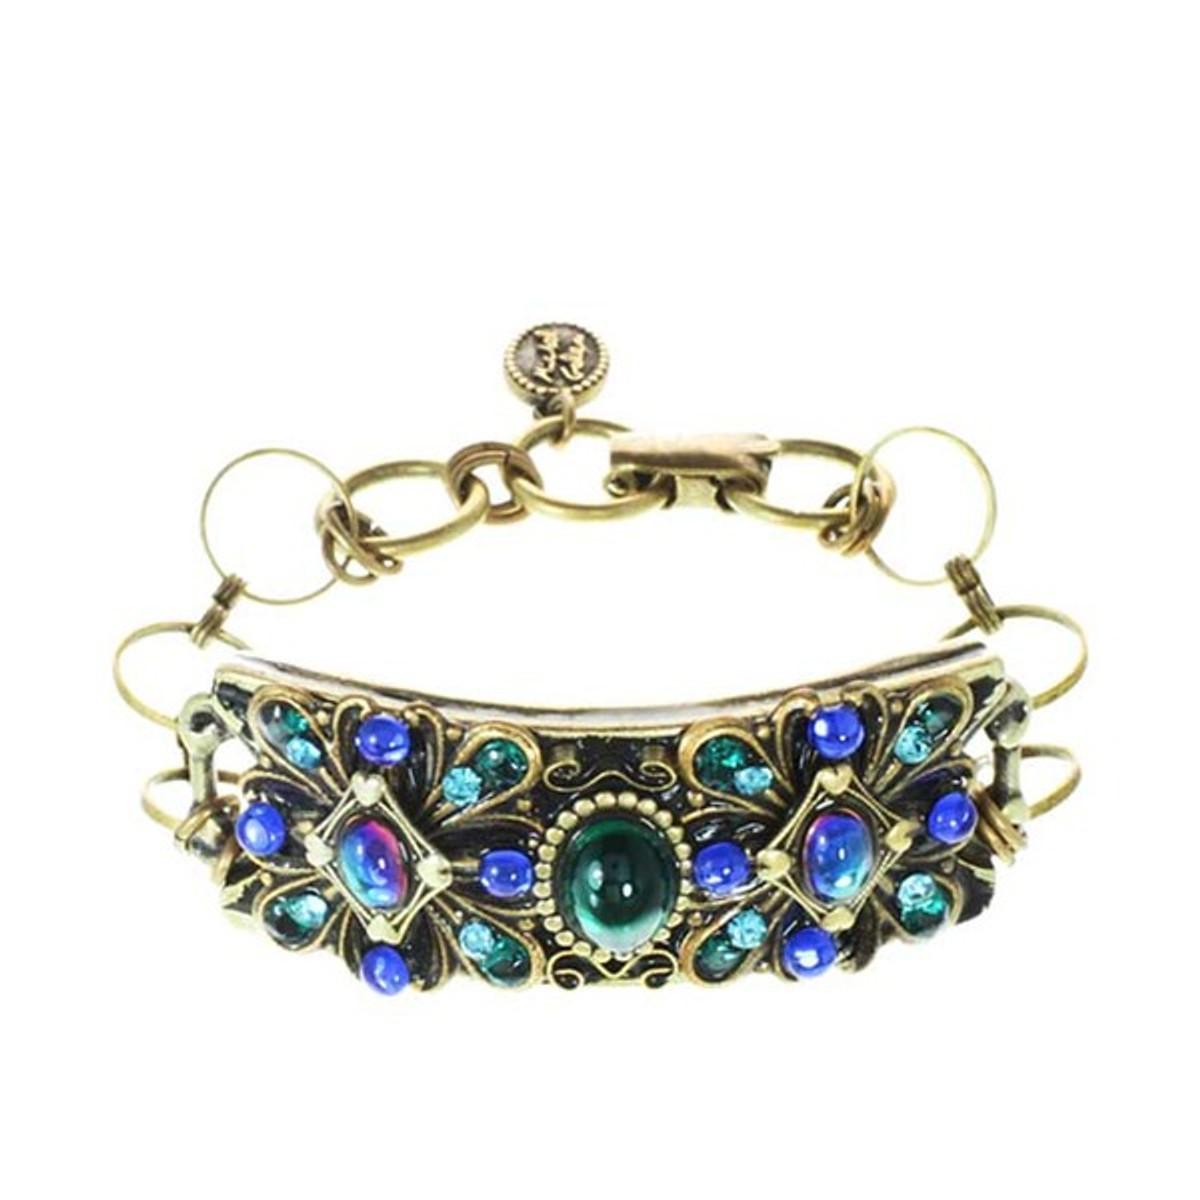 Peacock Bracelet From Michal Golan Jewelry